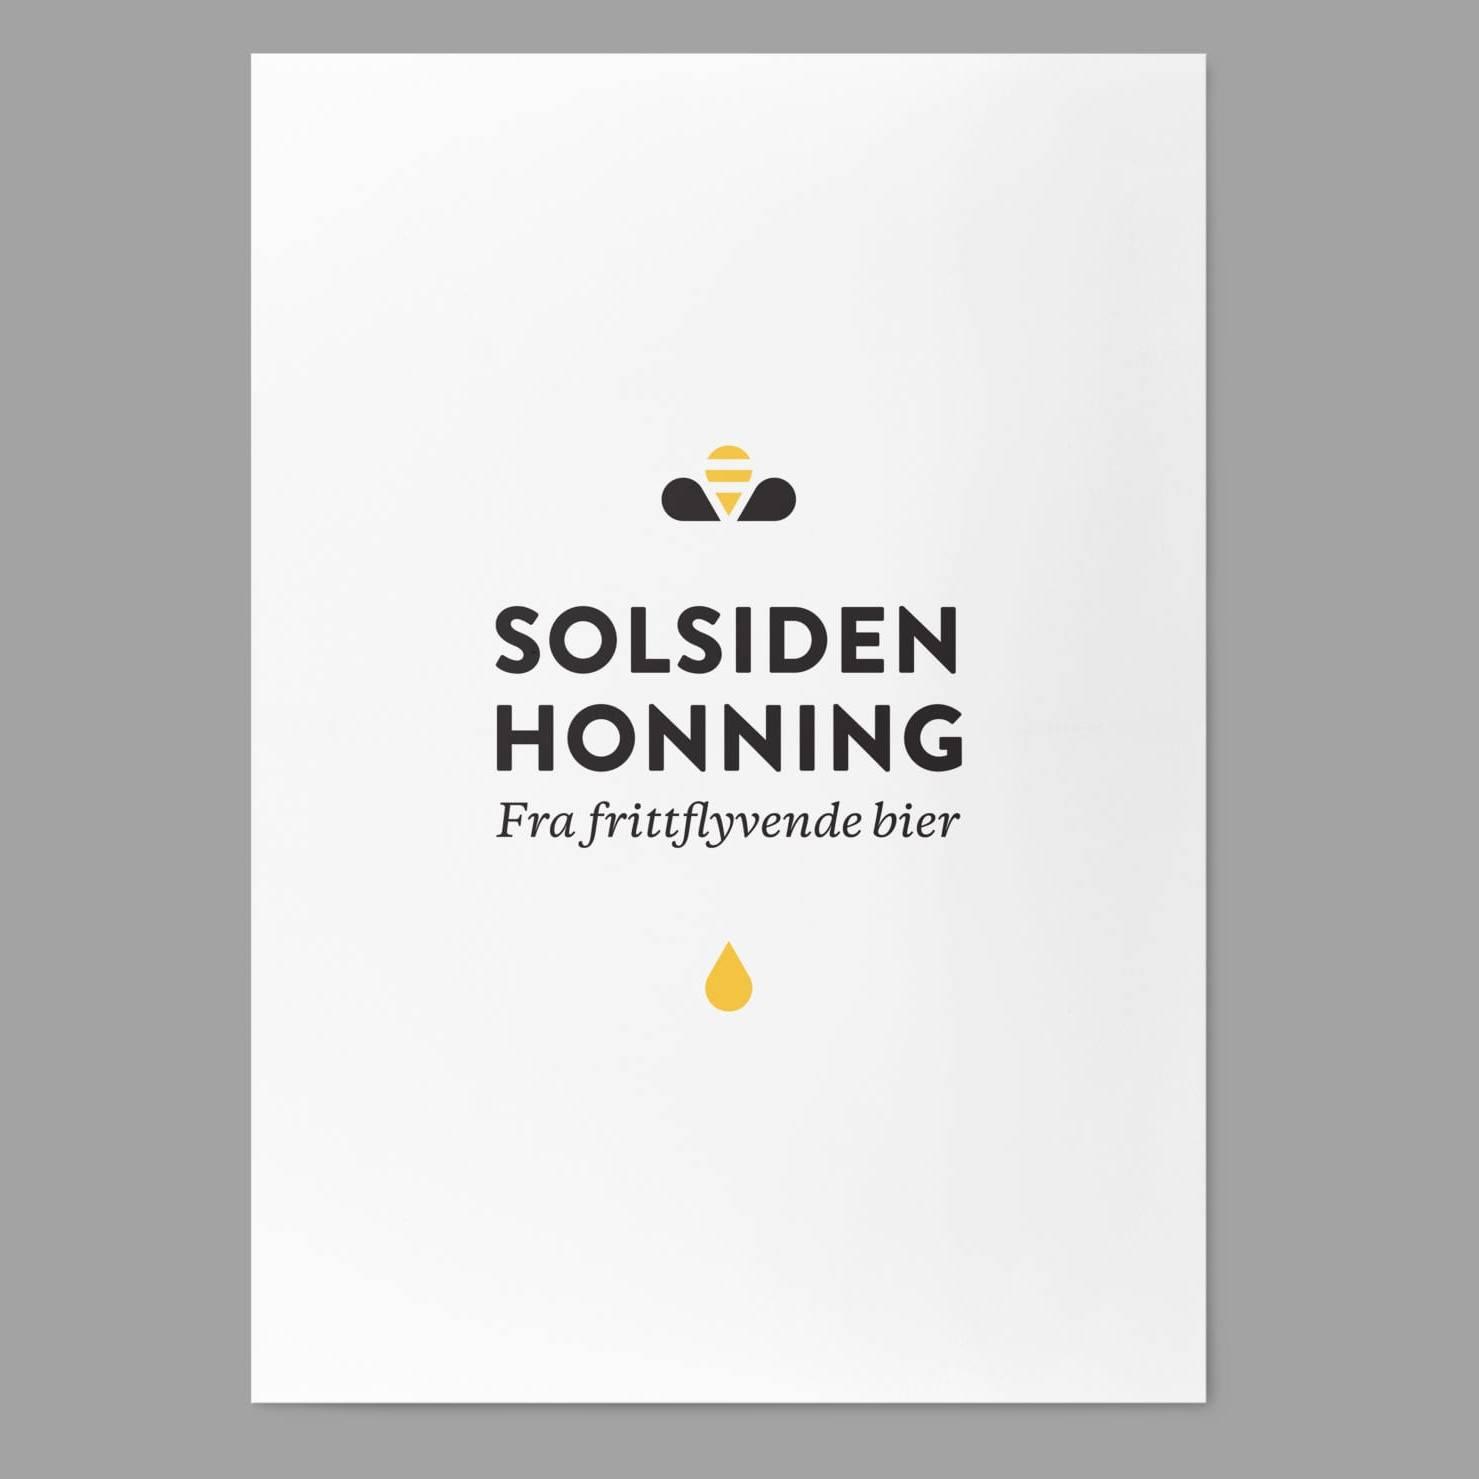 Solsiden Honning. Foto: Ren Røros Frontal.